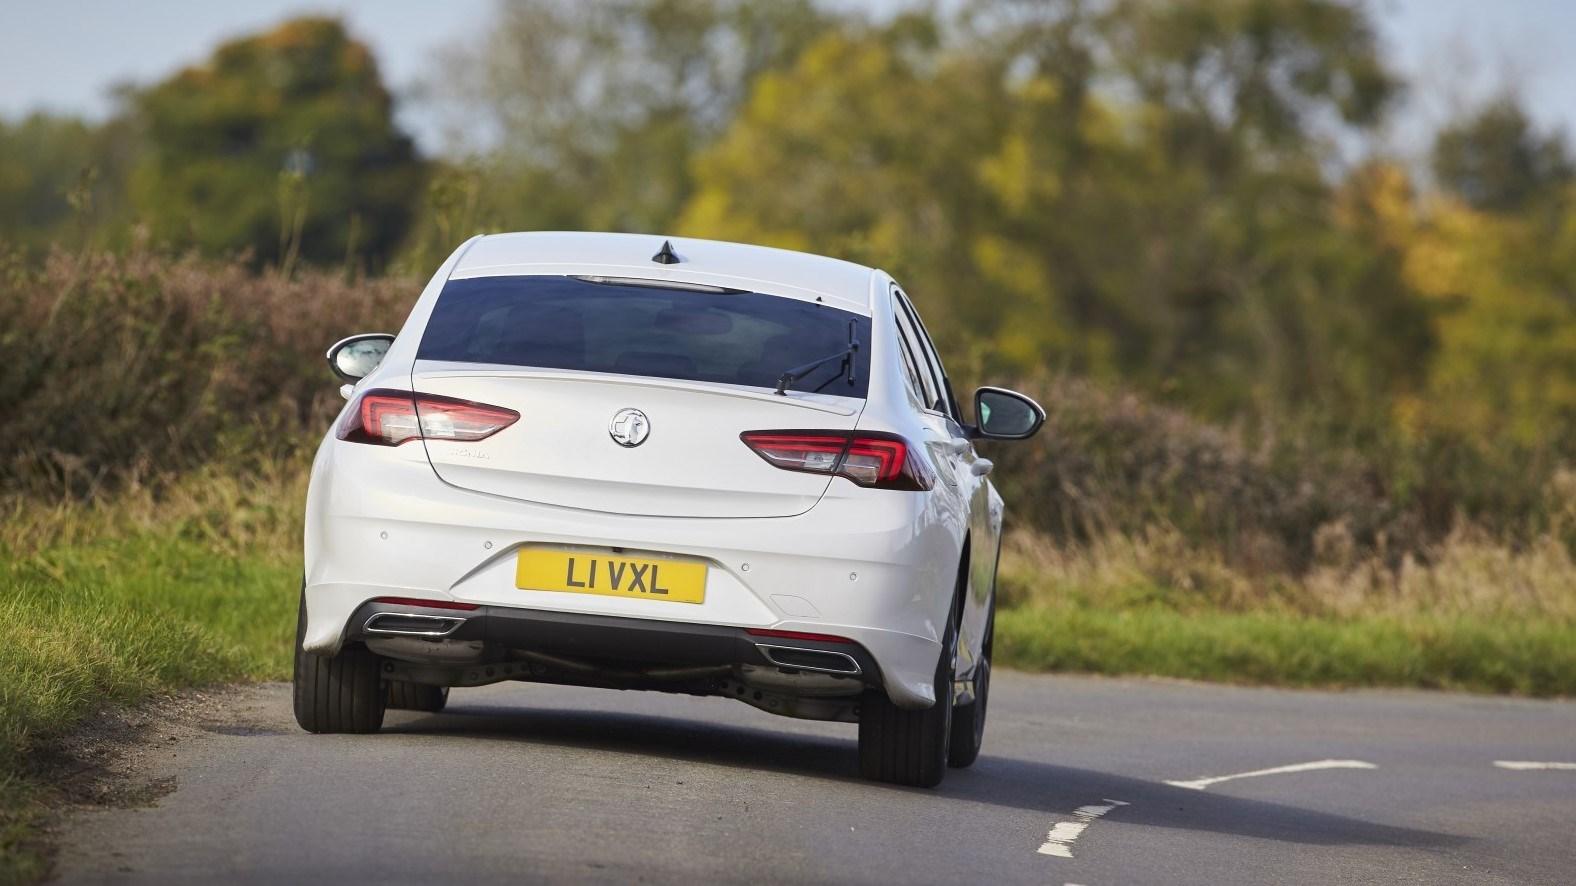 2021 Vauxhall Insignia - rear tracking